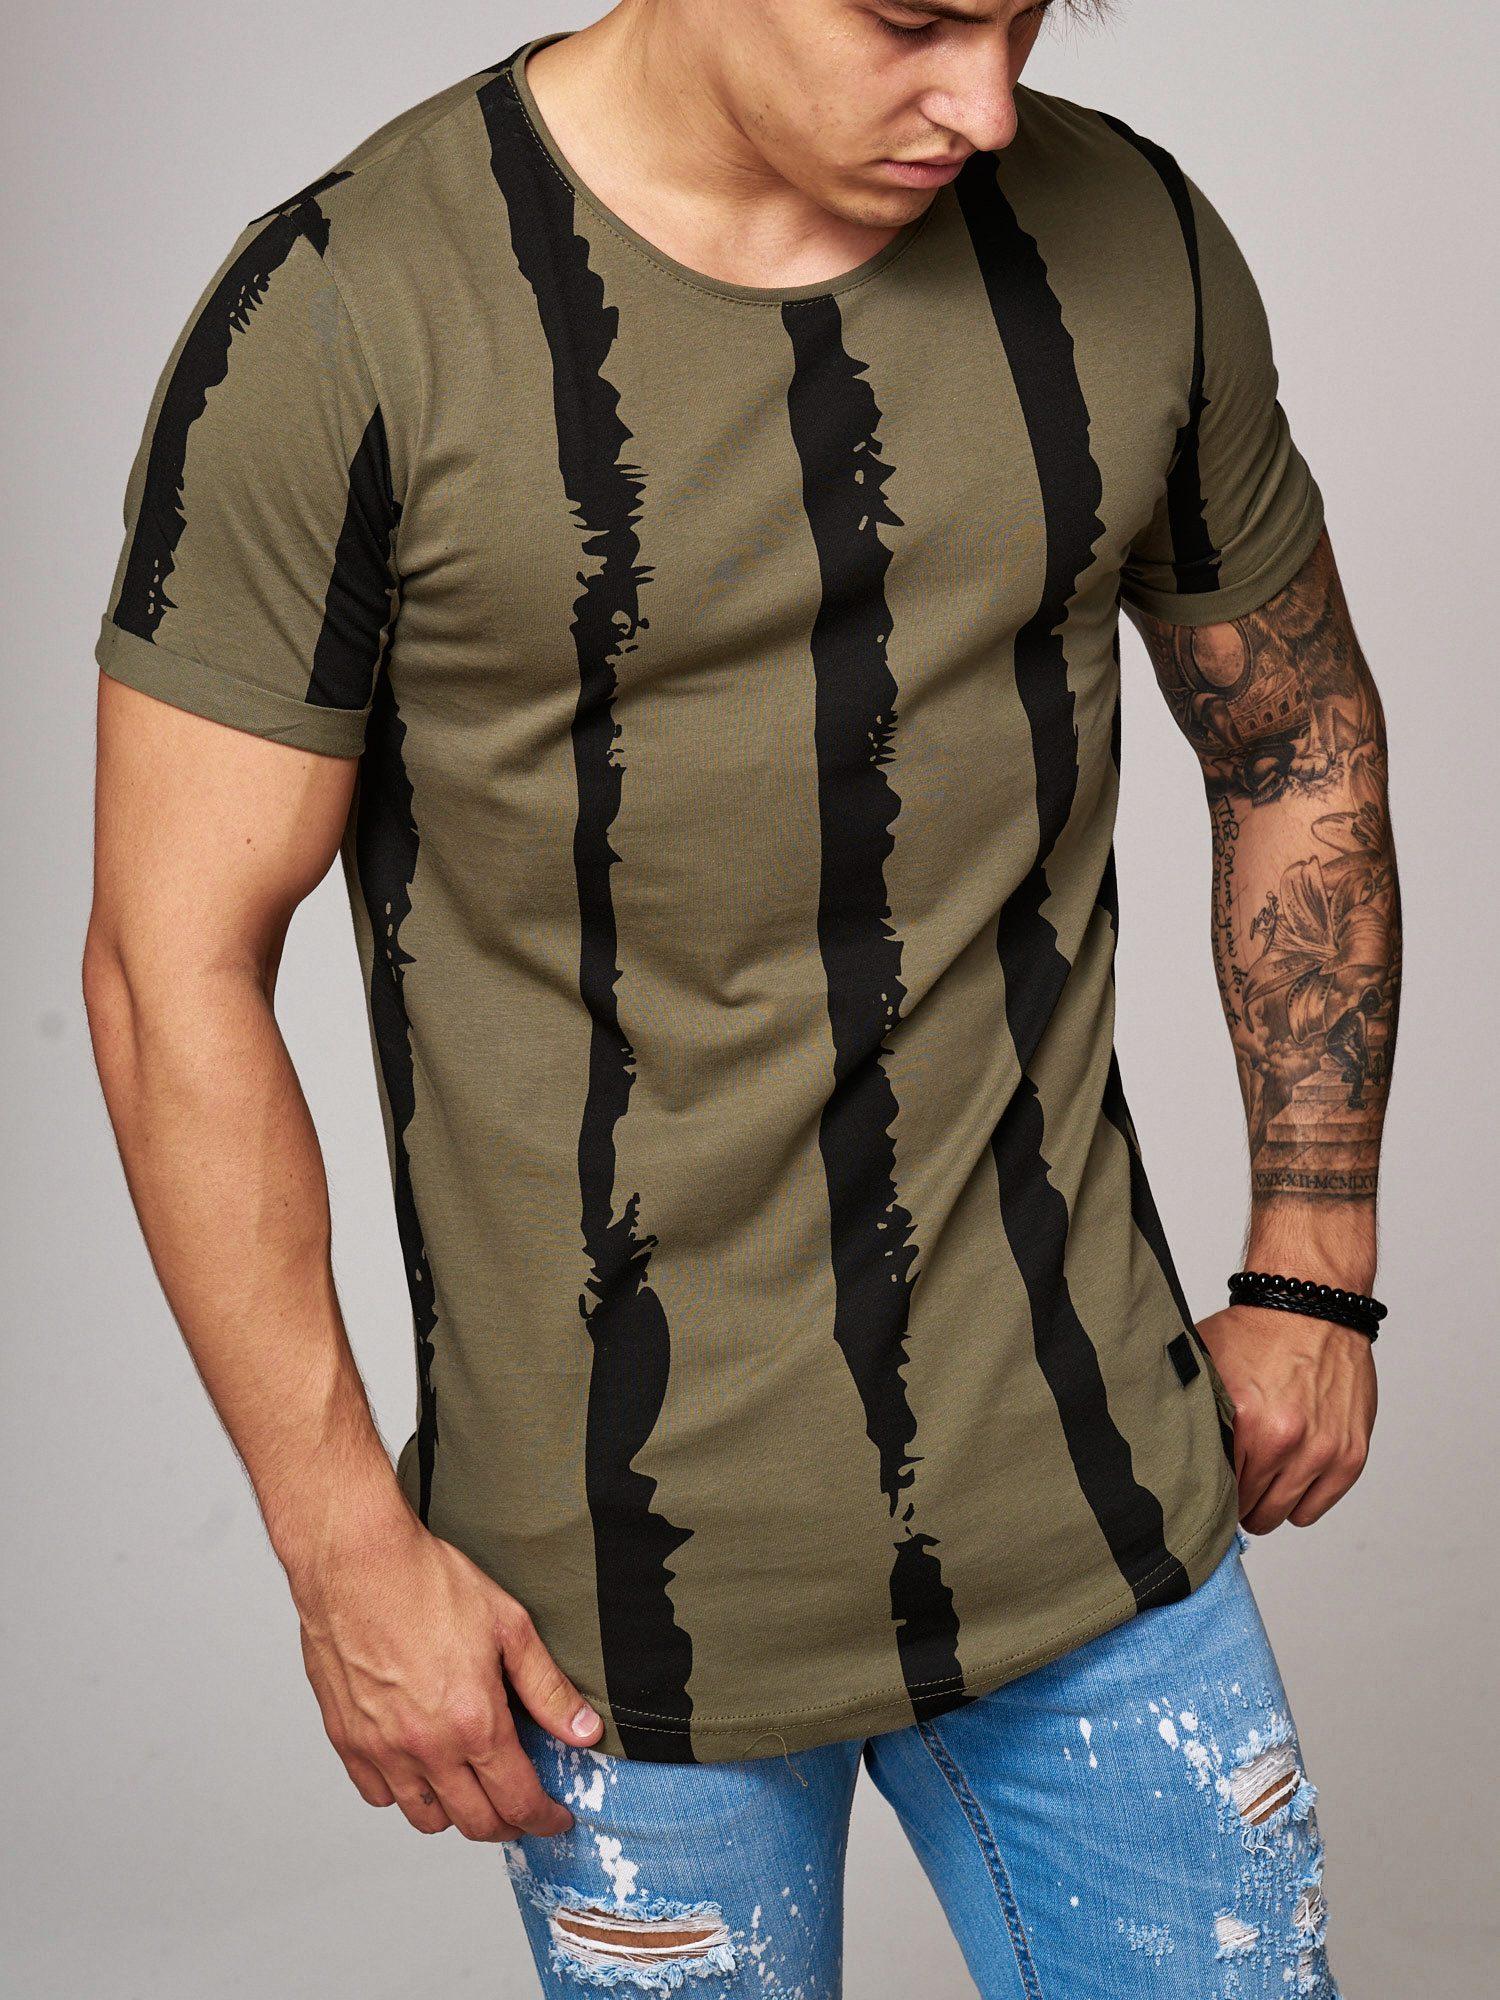 T-shirt-da-Uomo-Polo-Shirt-a-Maniche-Corte-printshirt-Polo-a-Maniche-Corte-17018-John-Kayna miniatura 19